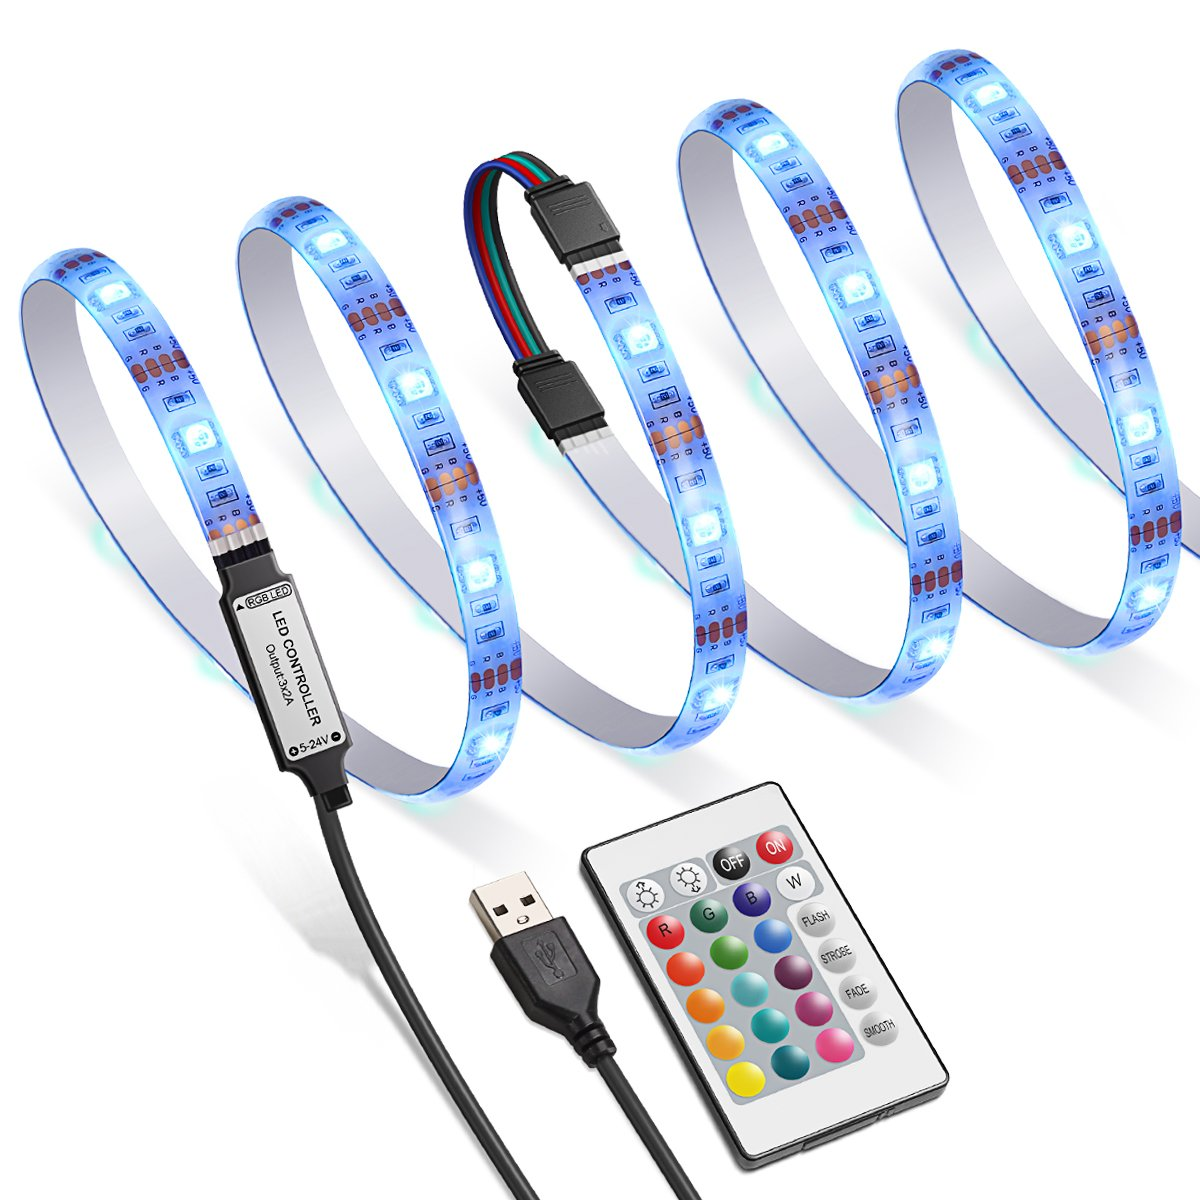 AMIR TV LED Backlight Kit, RGB Light Strip Kit Bias Lighting with Remote Control, USB LED Strip Lights for 40-60 inch HDTV, Monitor PC, Car & More (4pcs x 50cm, 16 Colors & 4 Modes)